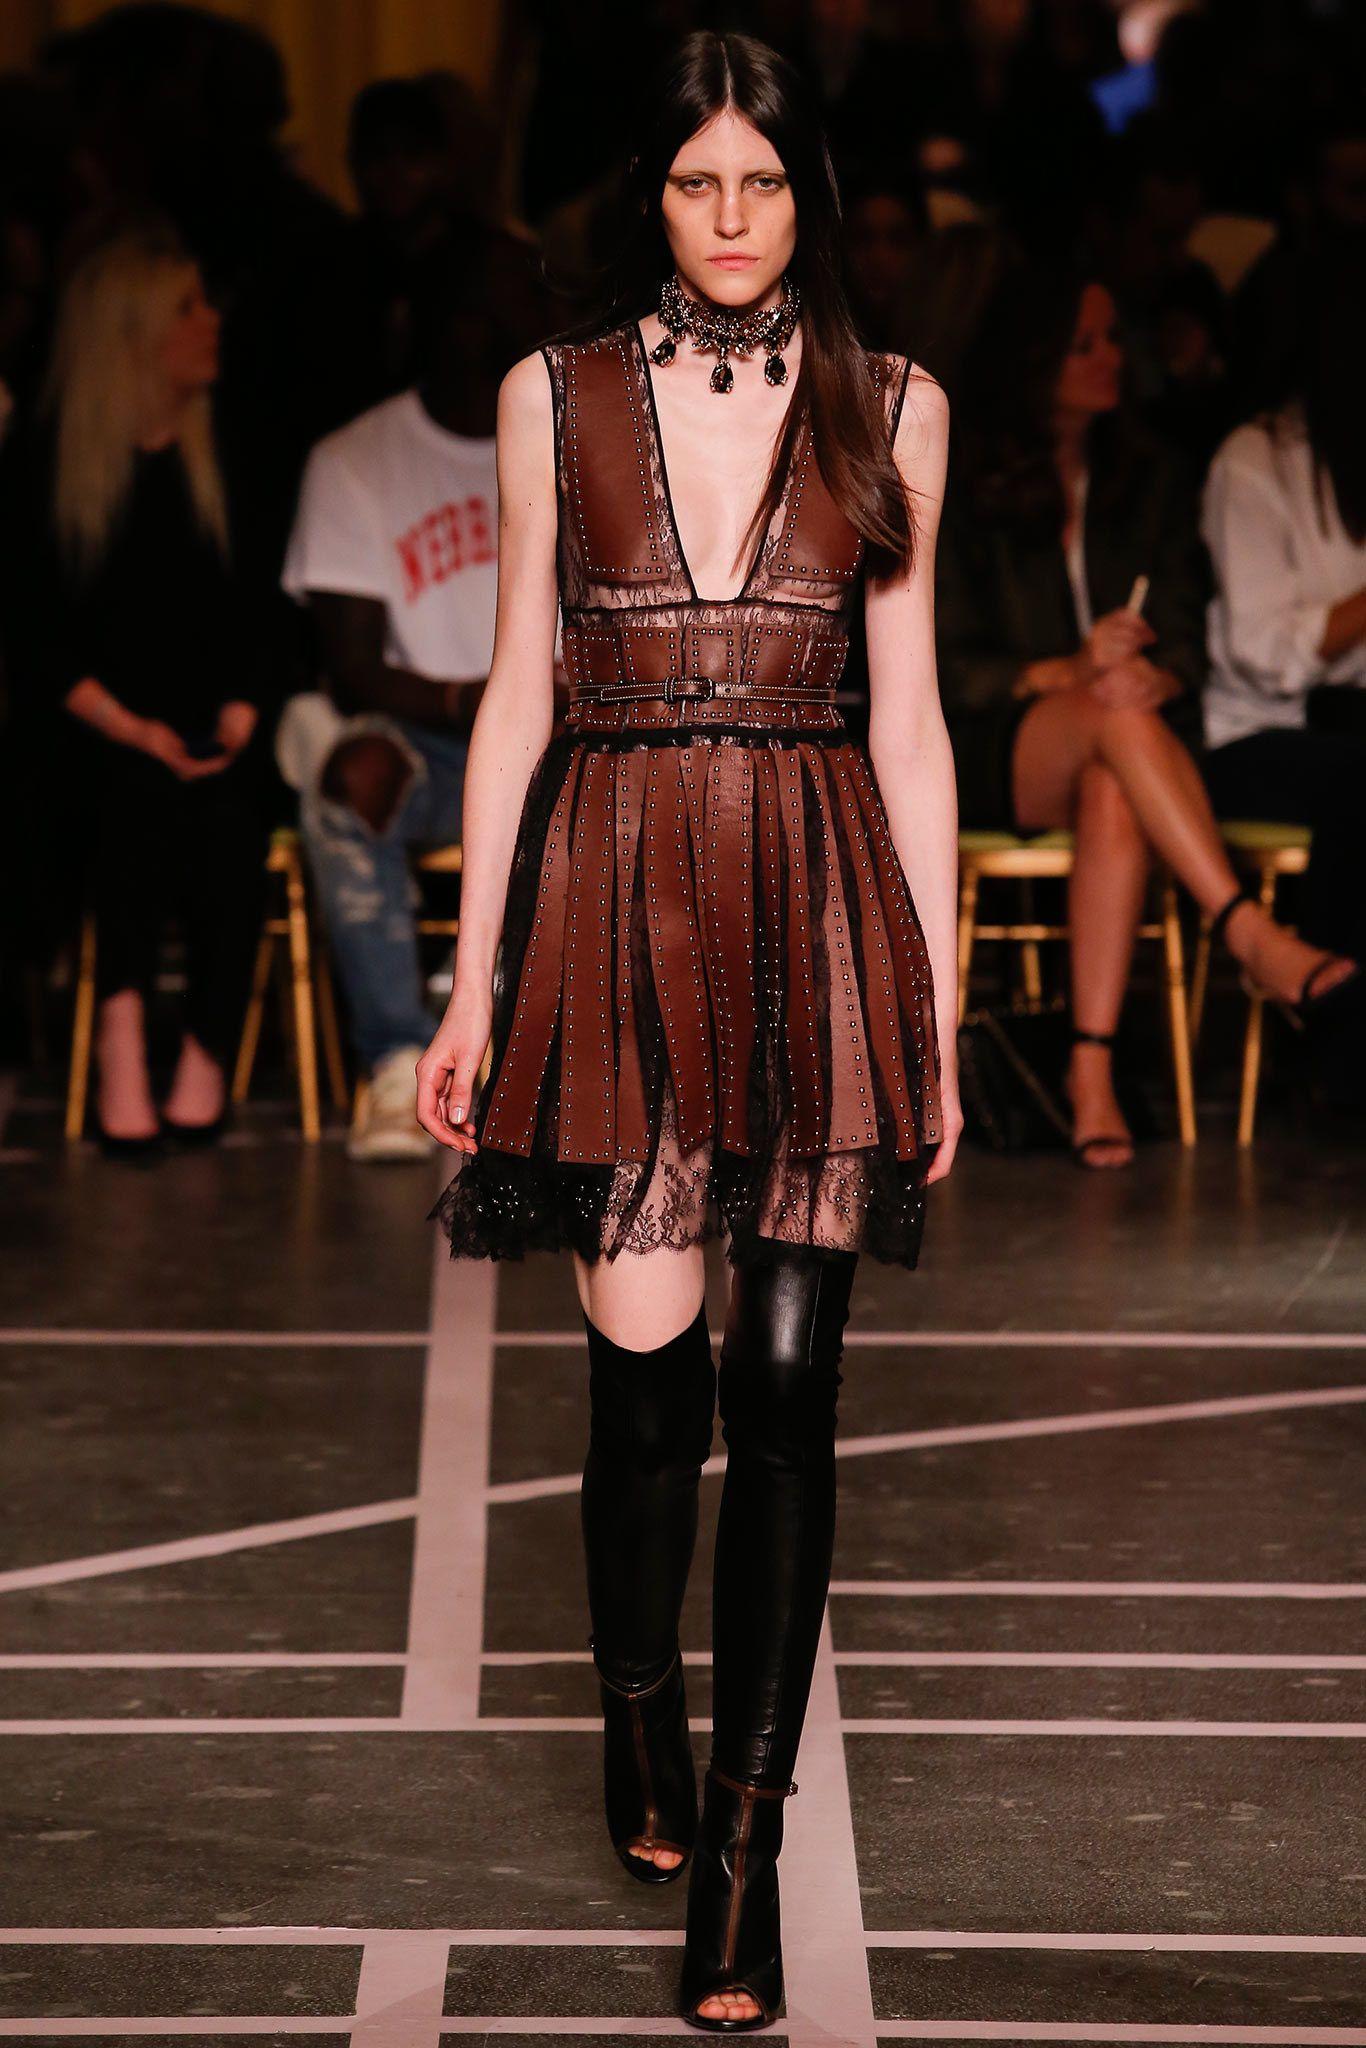 Givenchy Spring 2015 Ready-to-Wear Fashion Show - Serena Archetti (Women)